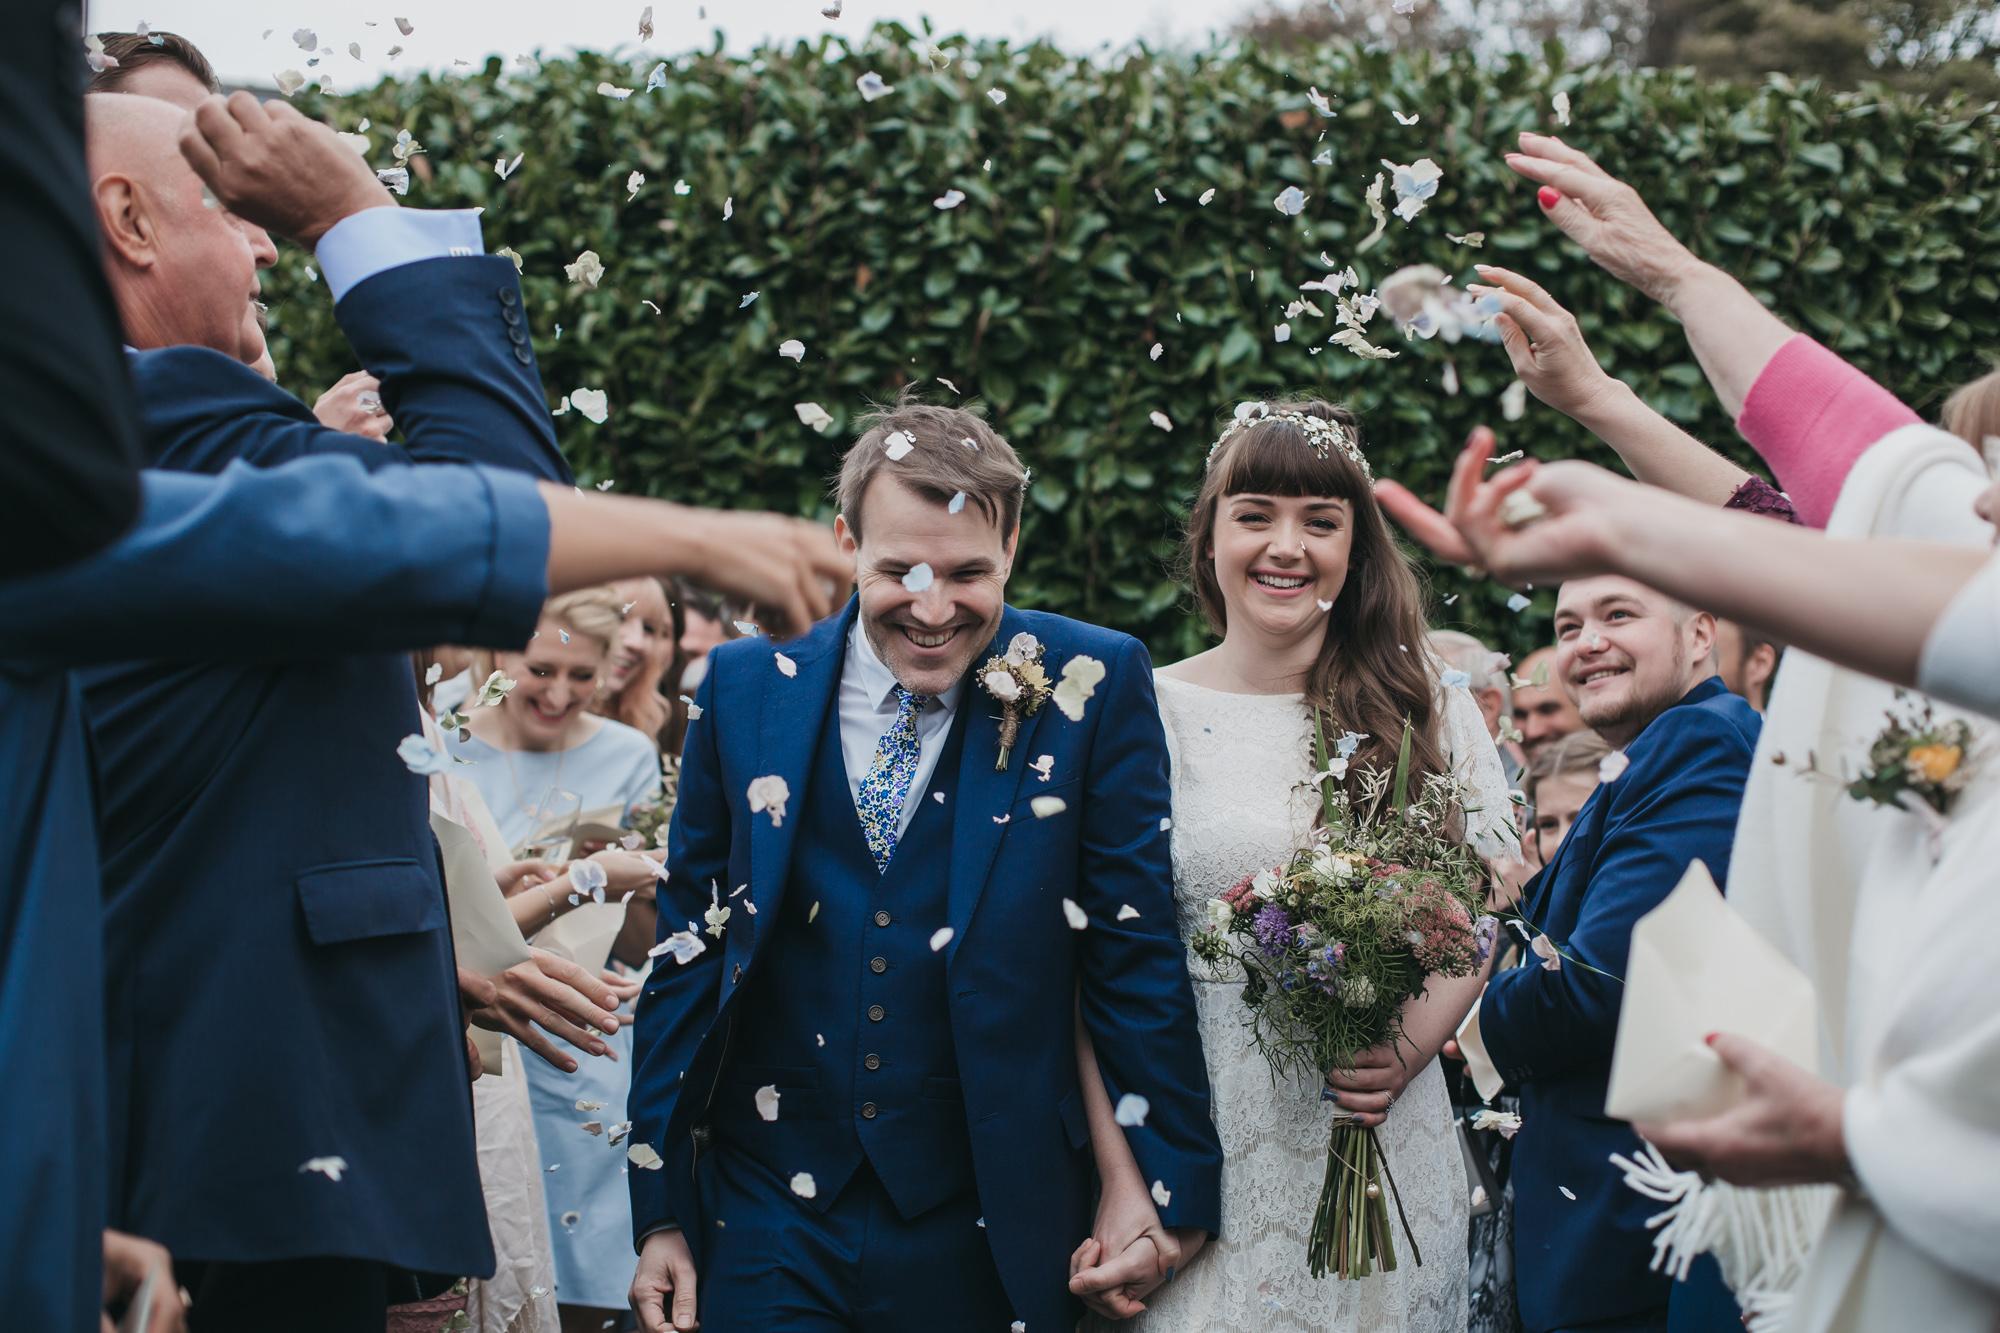 Kristy-Back-Garden-Outdoor-Wedding-Sheffield-Industrial-Warehouse-Wedding-Bohemian-Kate-Beaumont-Dahlia-Dress-20.jpg